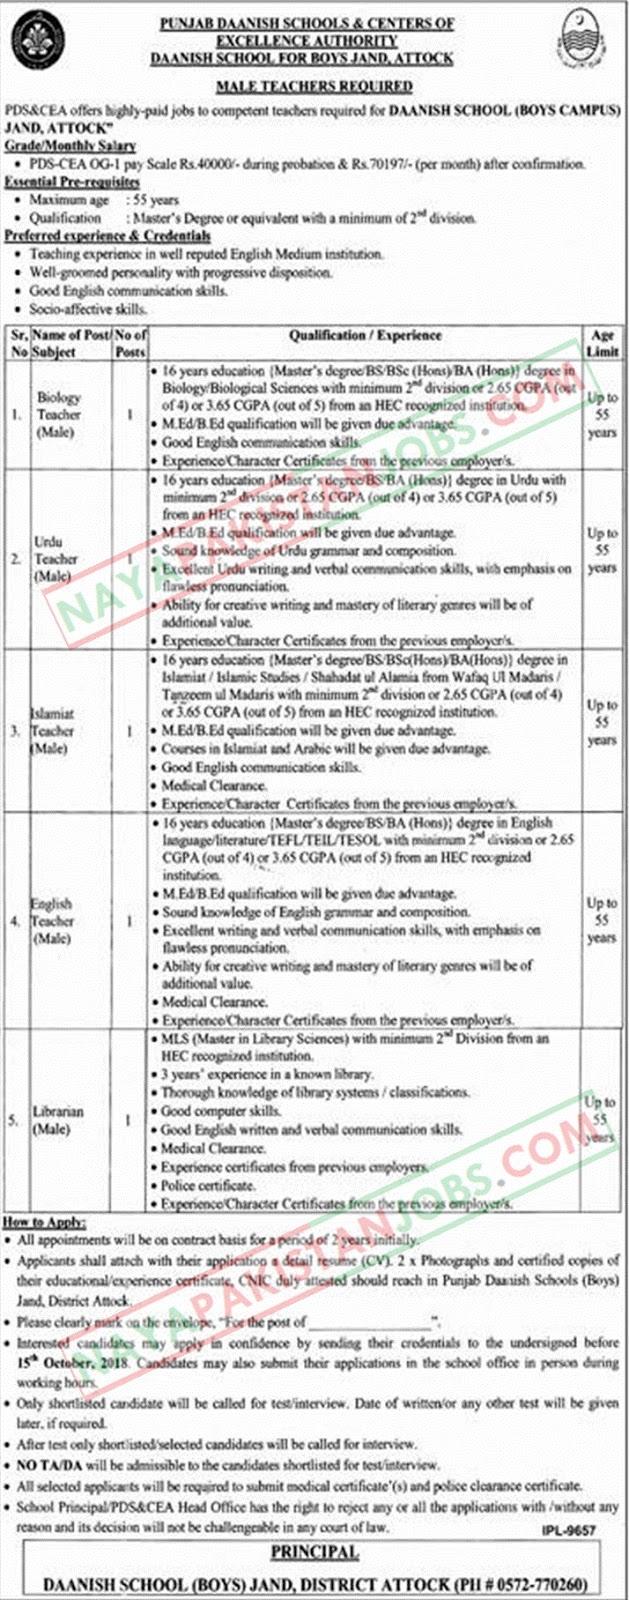 Latest Vacancies Announced in Daanish Schools Govt of Punjab 01 October 2018 - Naya Pak Jobs